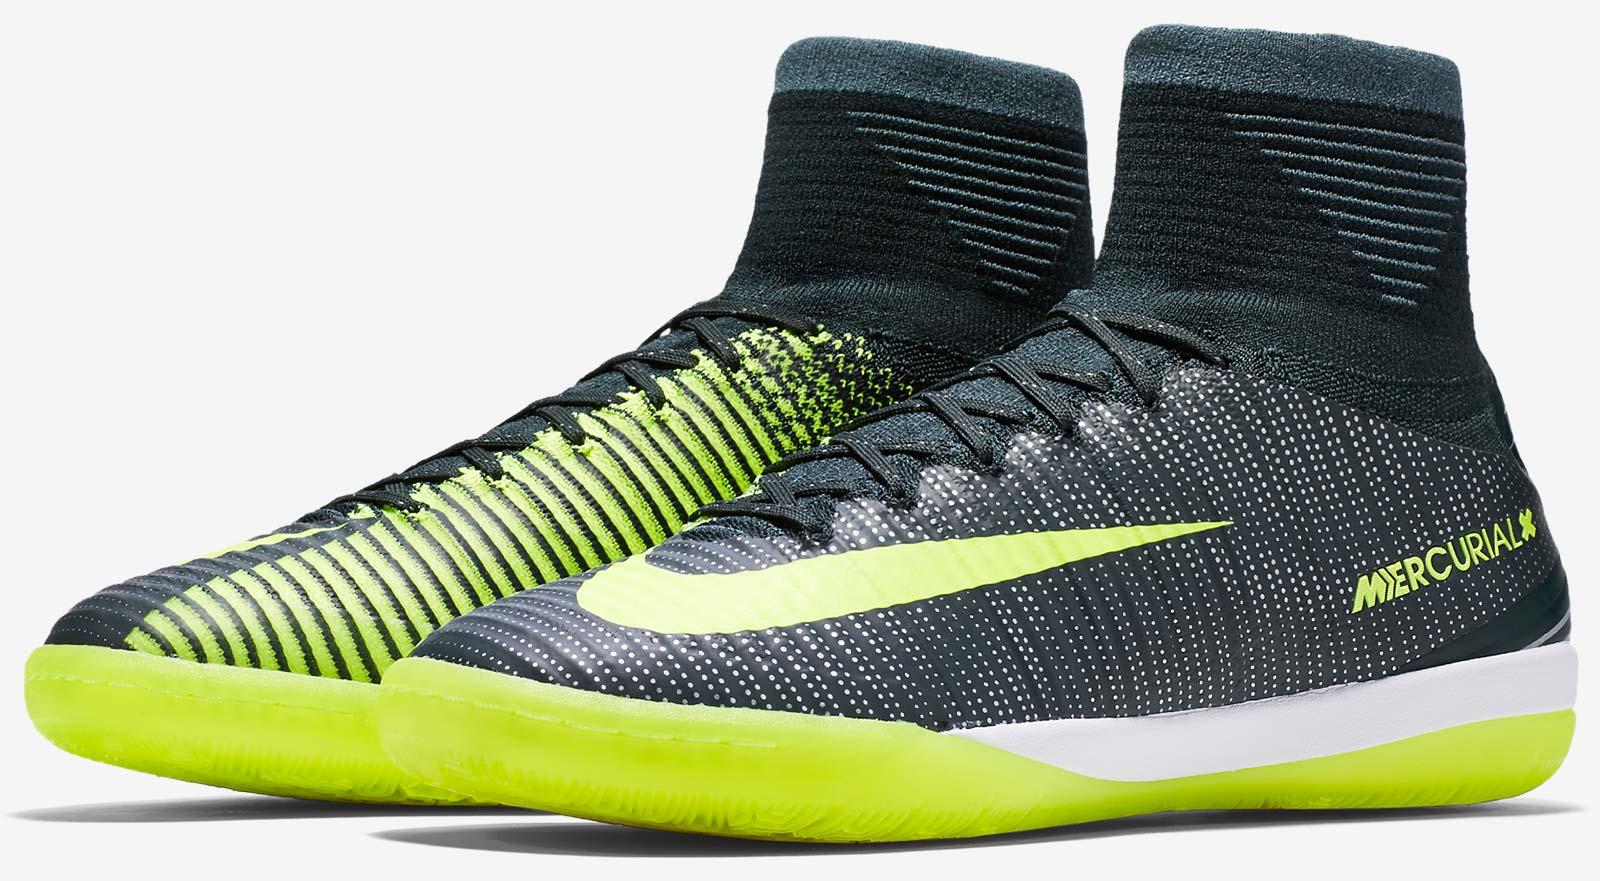 Cristiano Ronaldo New Shoes  Price